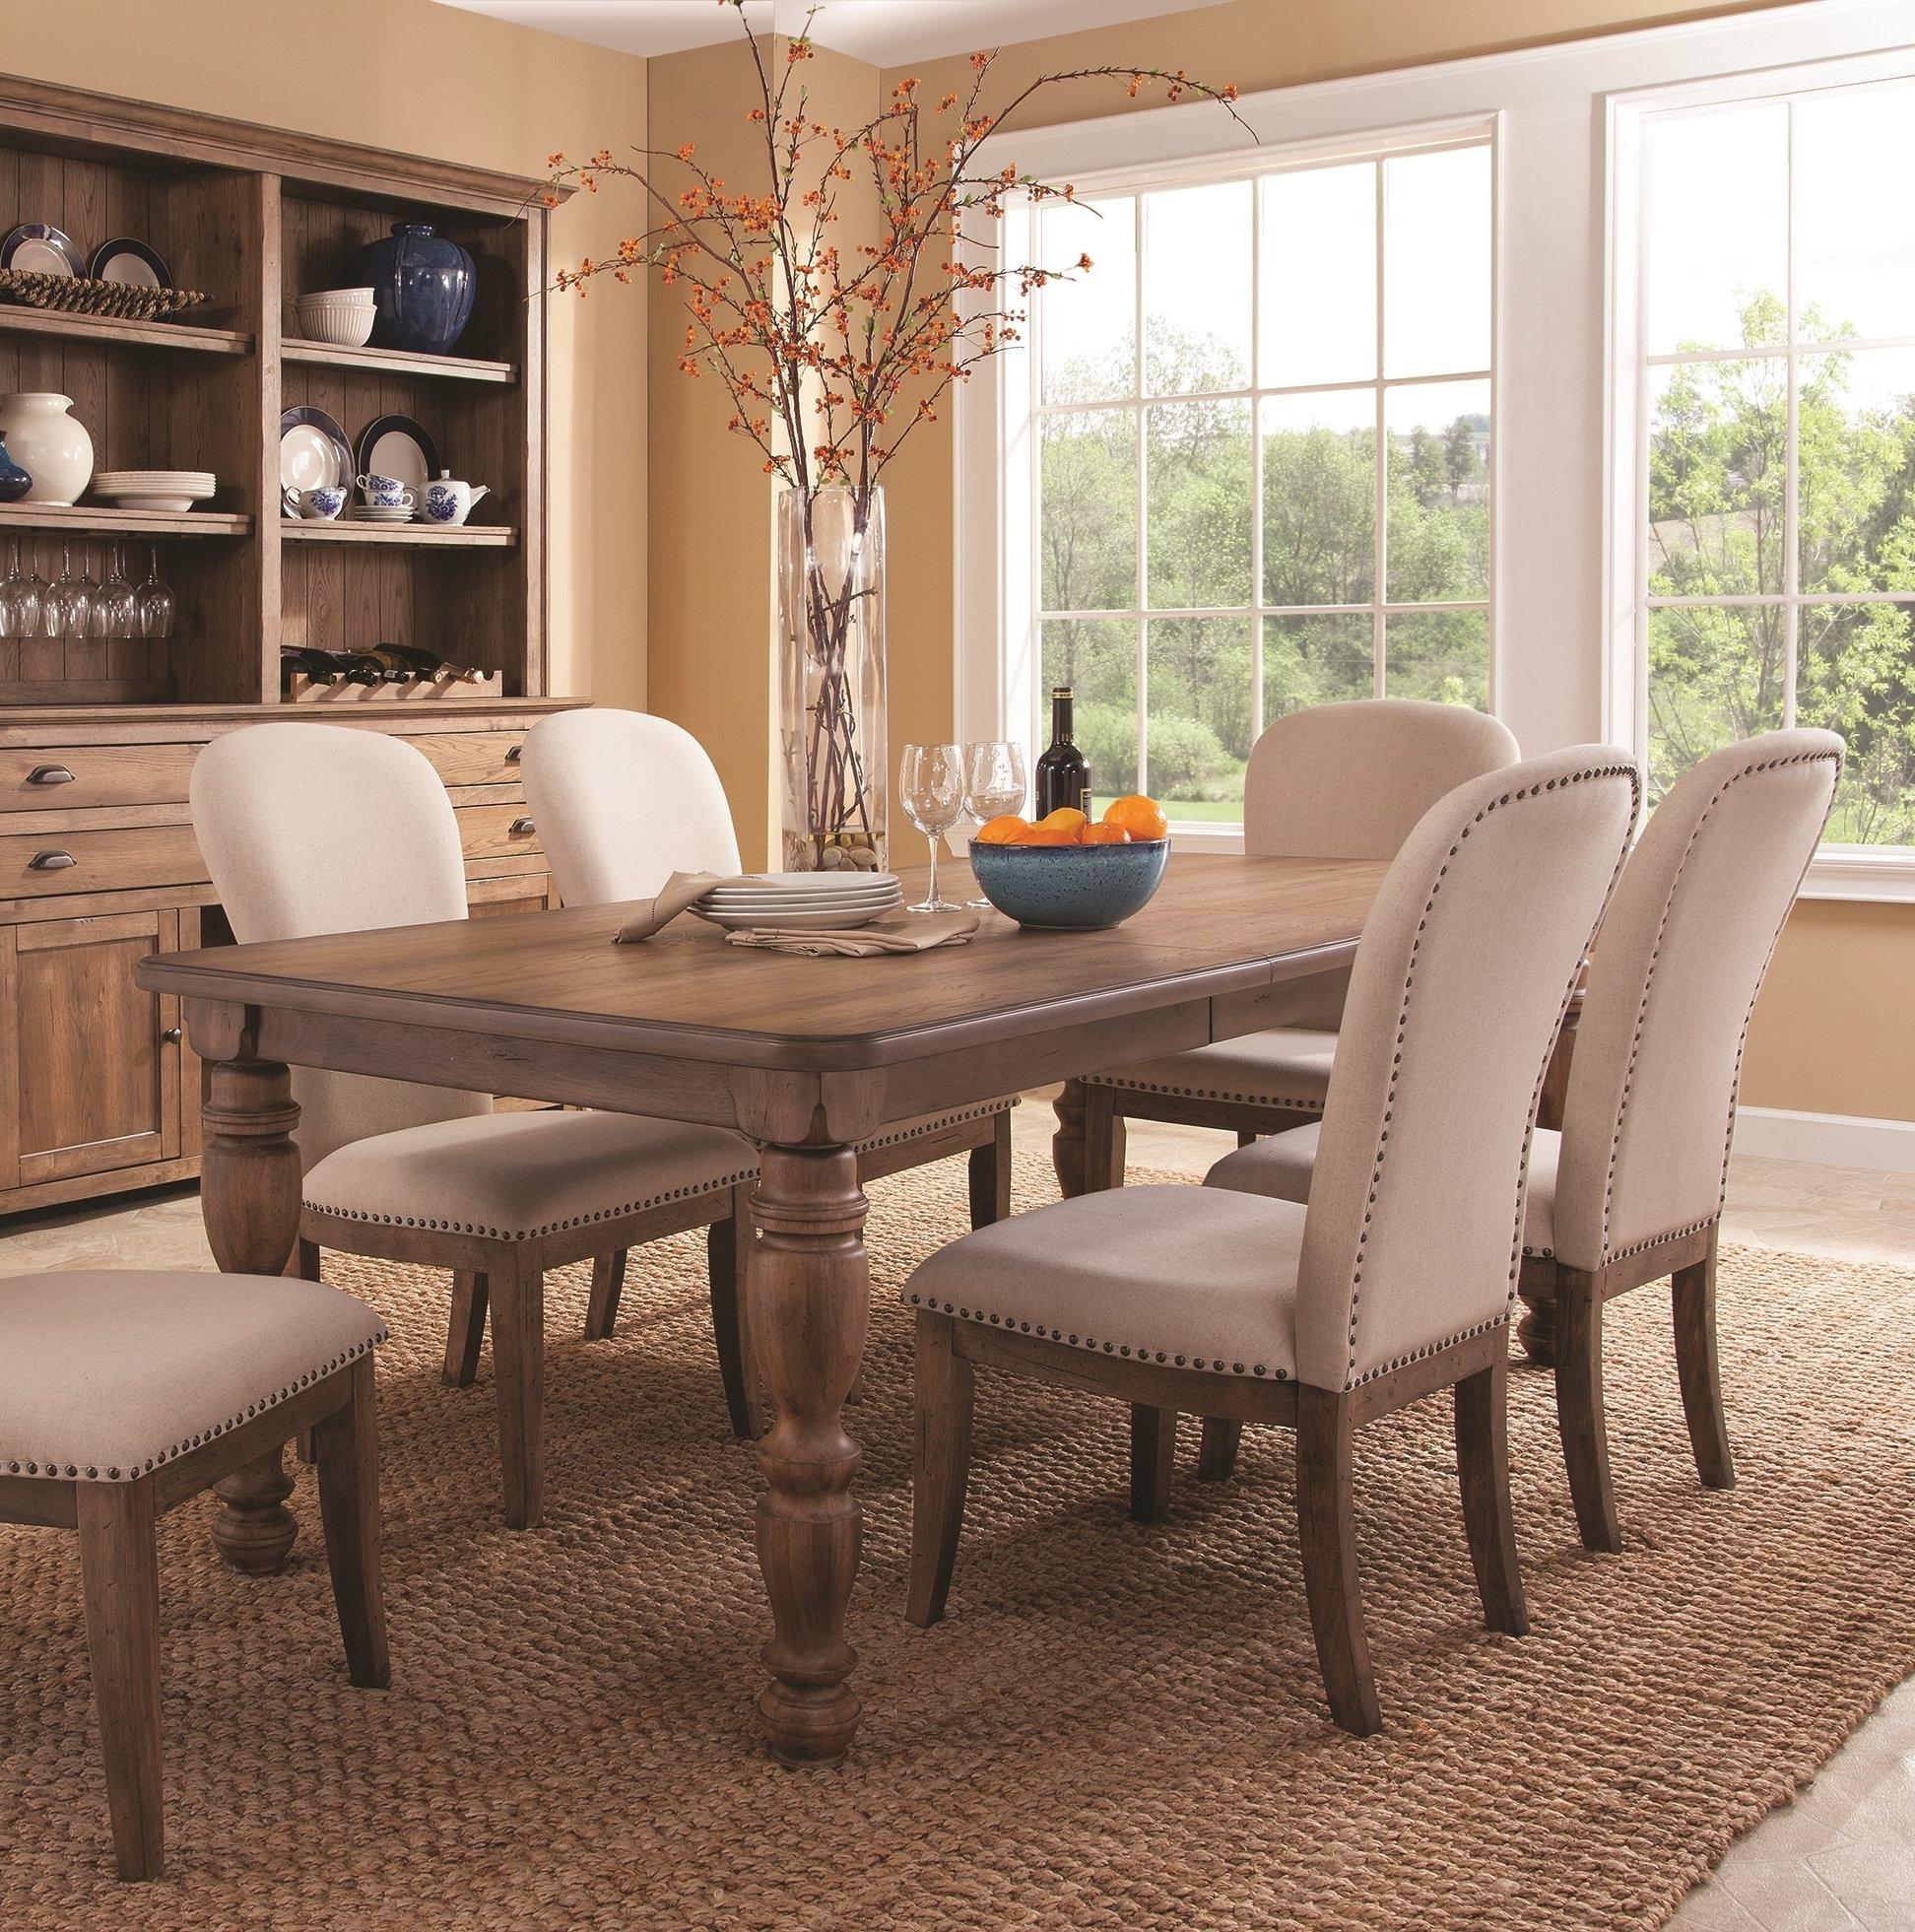 Extendable Dining Table Sets regarding Latest Panama Jack South Mountain Farmhouse Extendable Dining Table Set